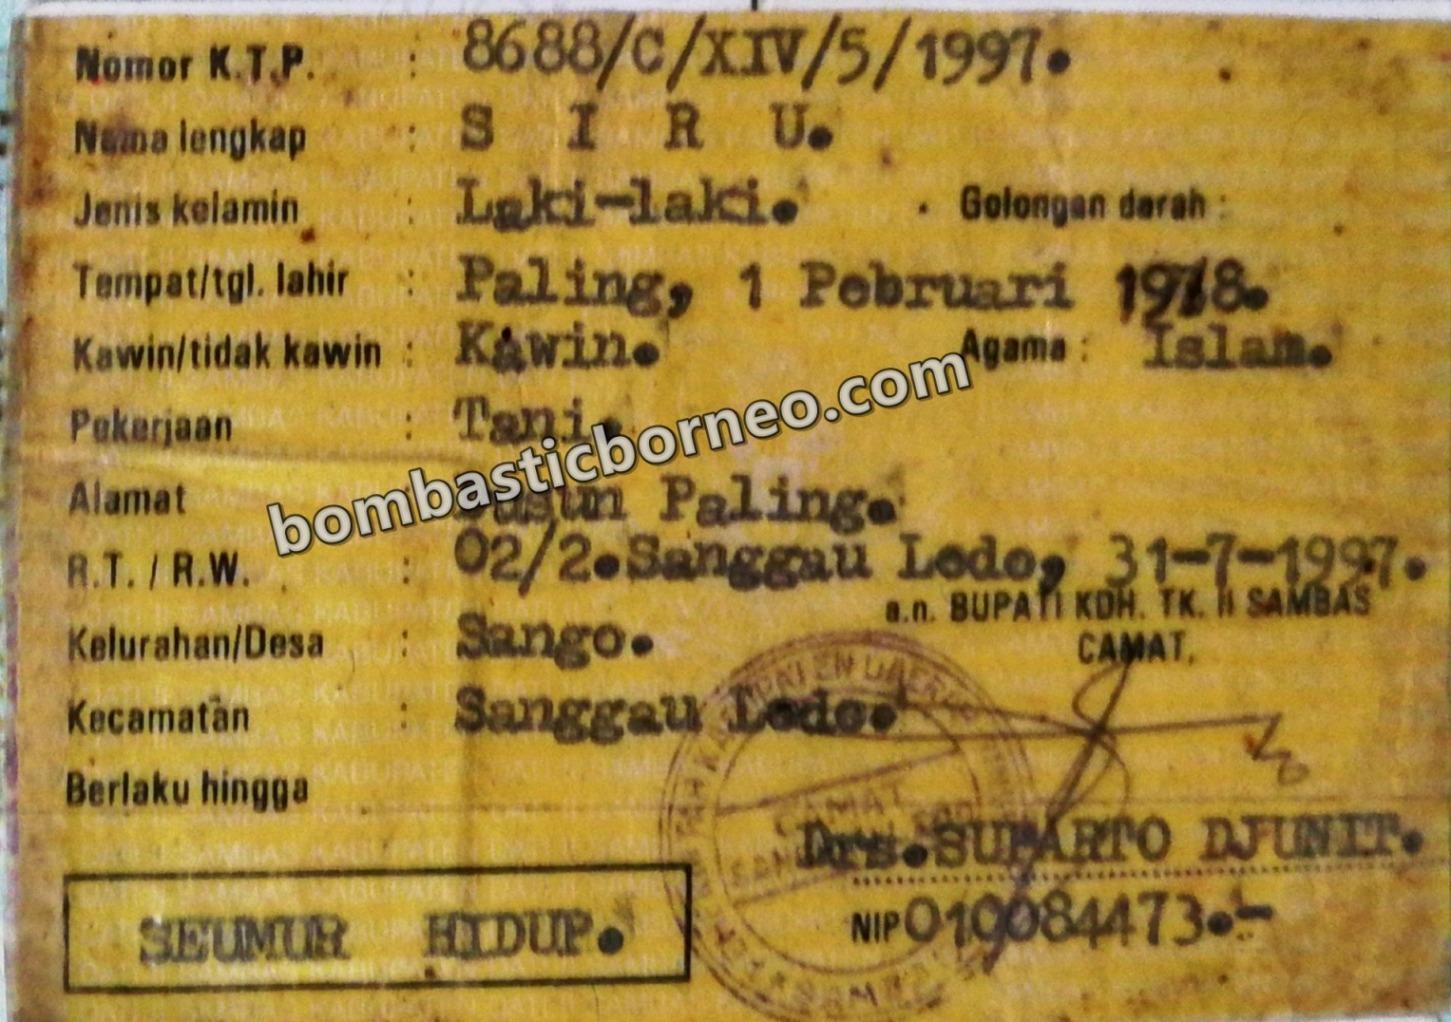 Dukun, Sifu, shaman, healer, sifu, dayak, Ethnic, native, Indonesia, Sango, Sanggau Ledo, village, Borneo,